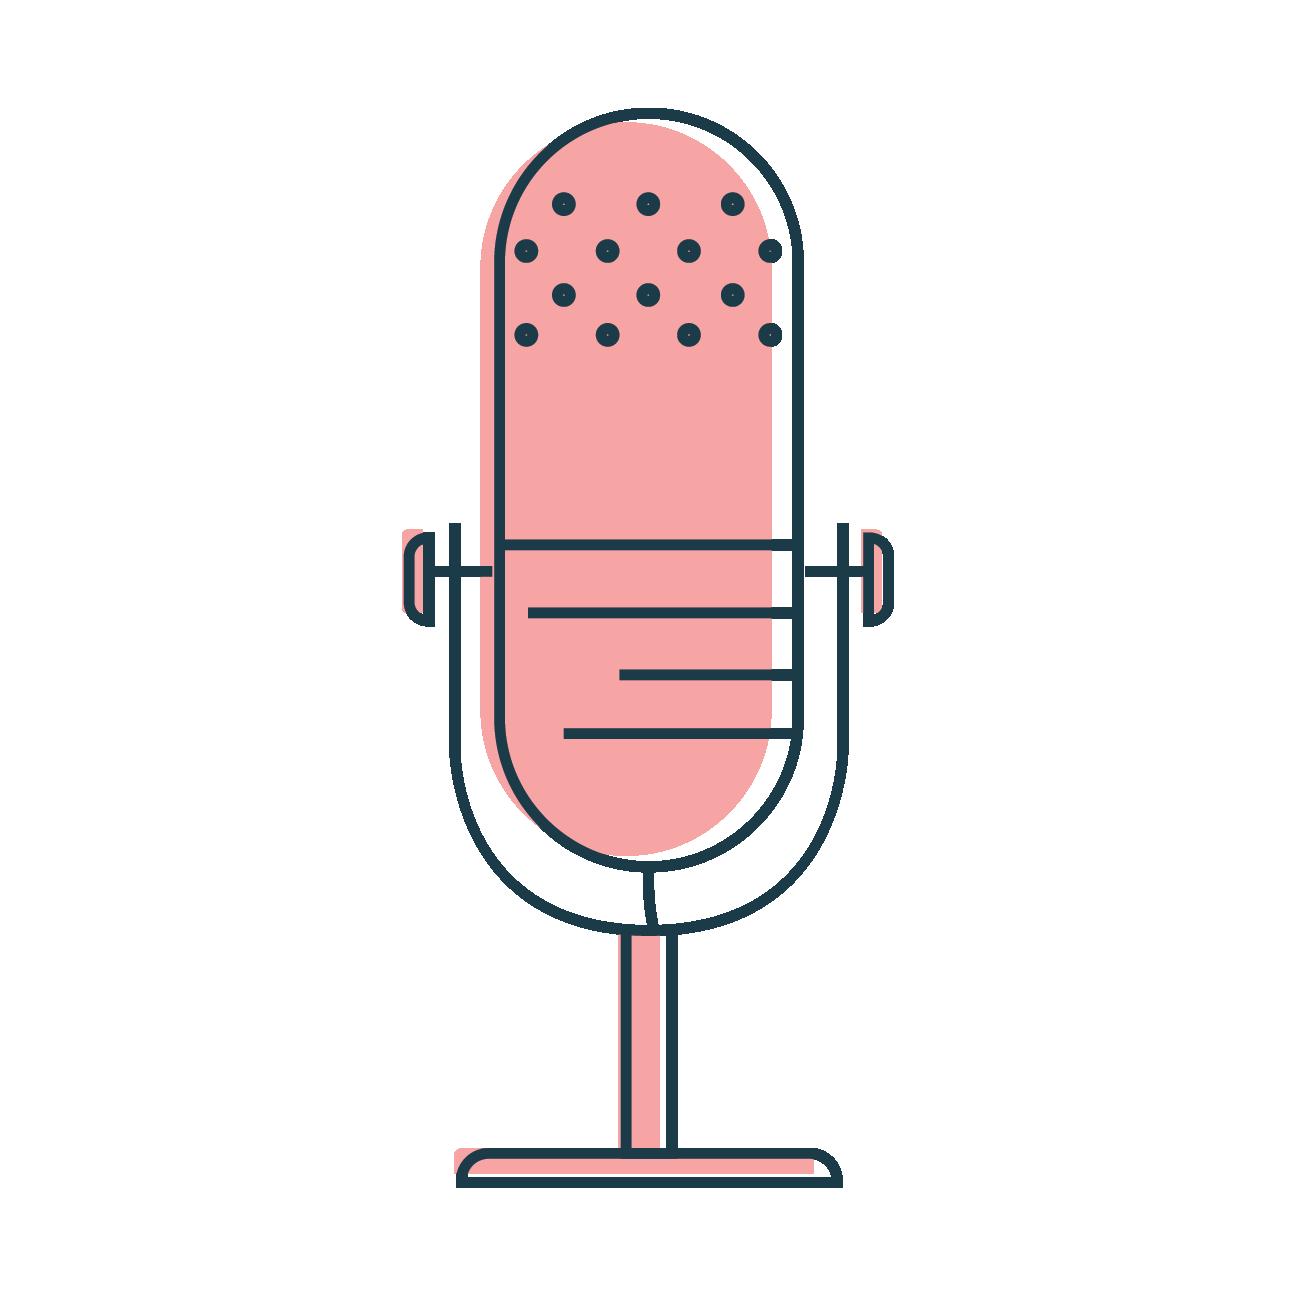 TheMerriweatherCouncil.Icons.Microphone.300DPI